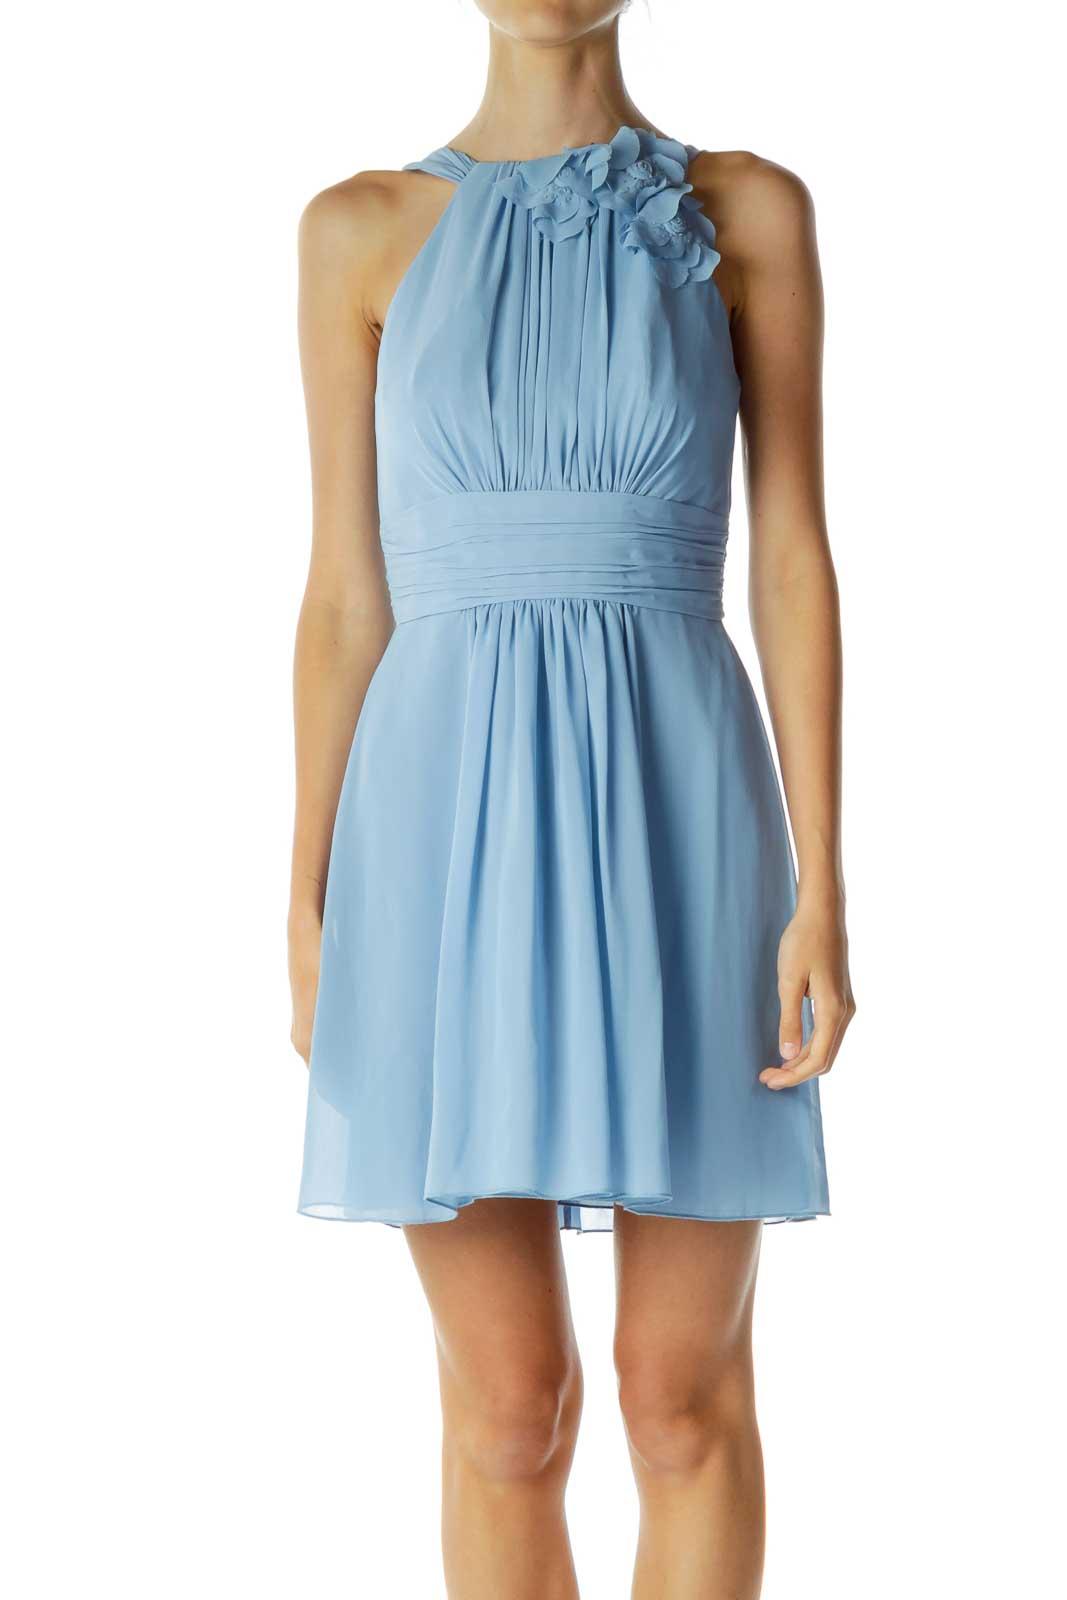 Blue Scrunched Flower Cocktail Dress Front